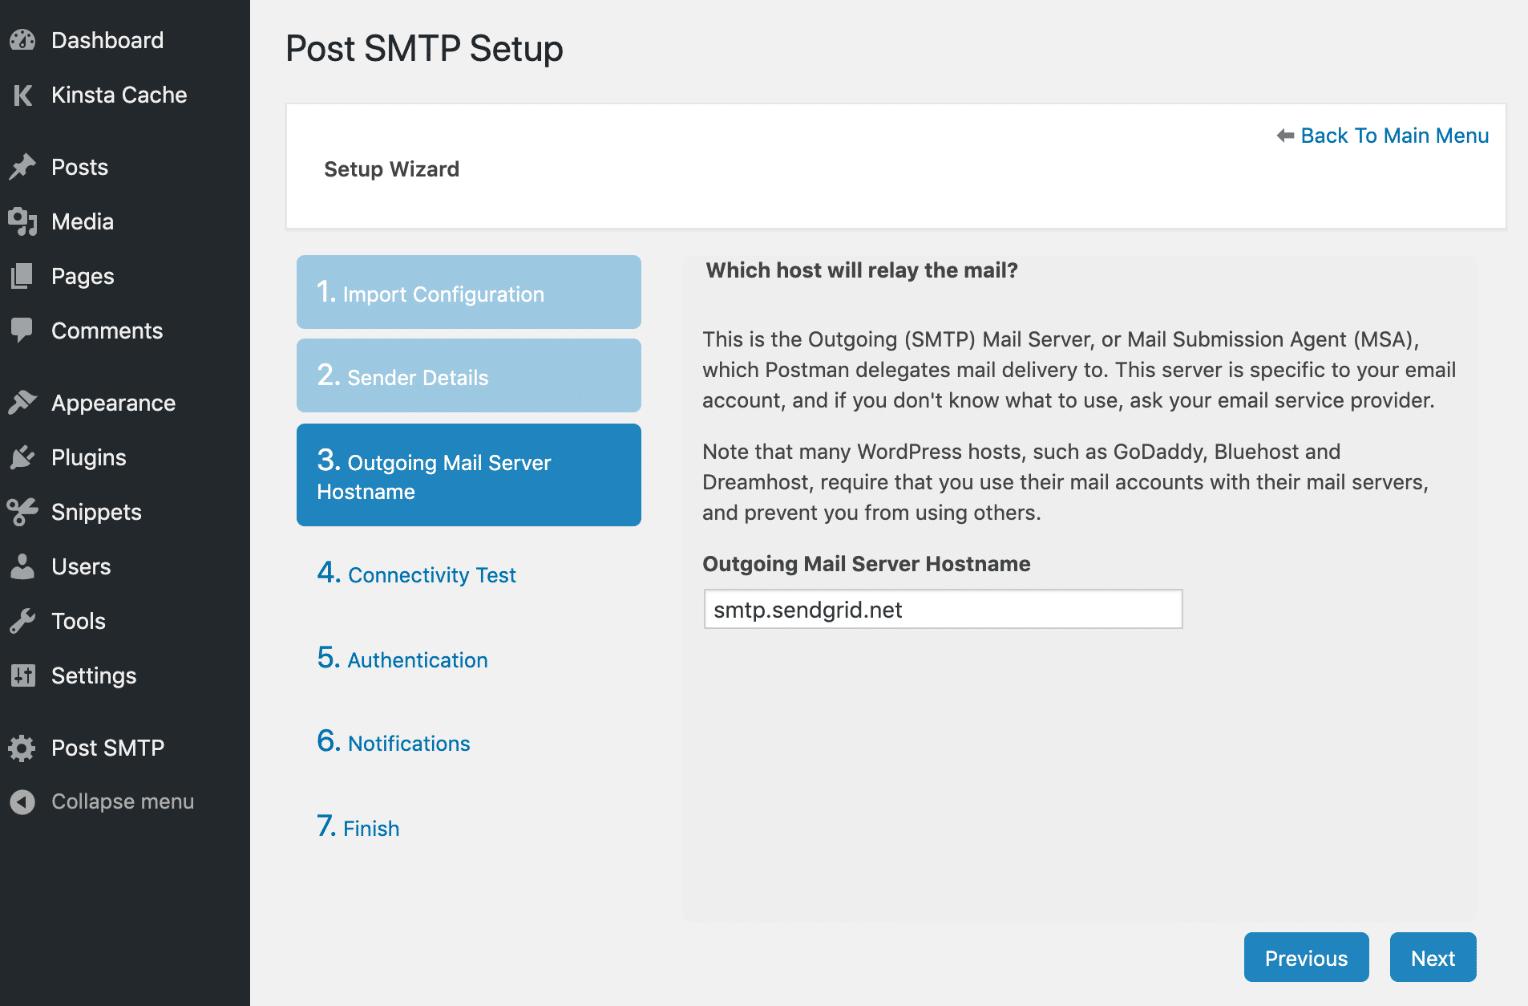 Post SMTP Hostnaam uitgaande mailserver